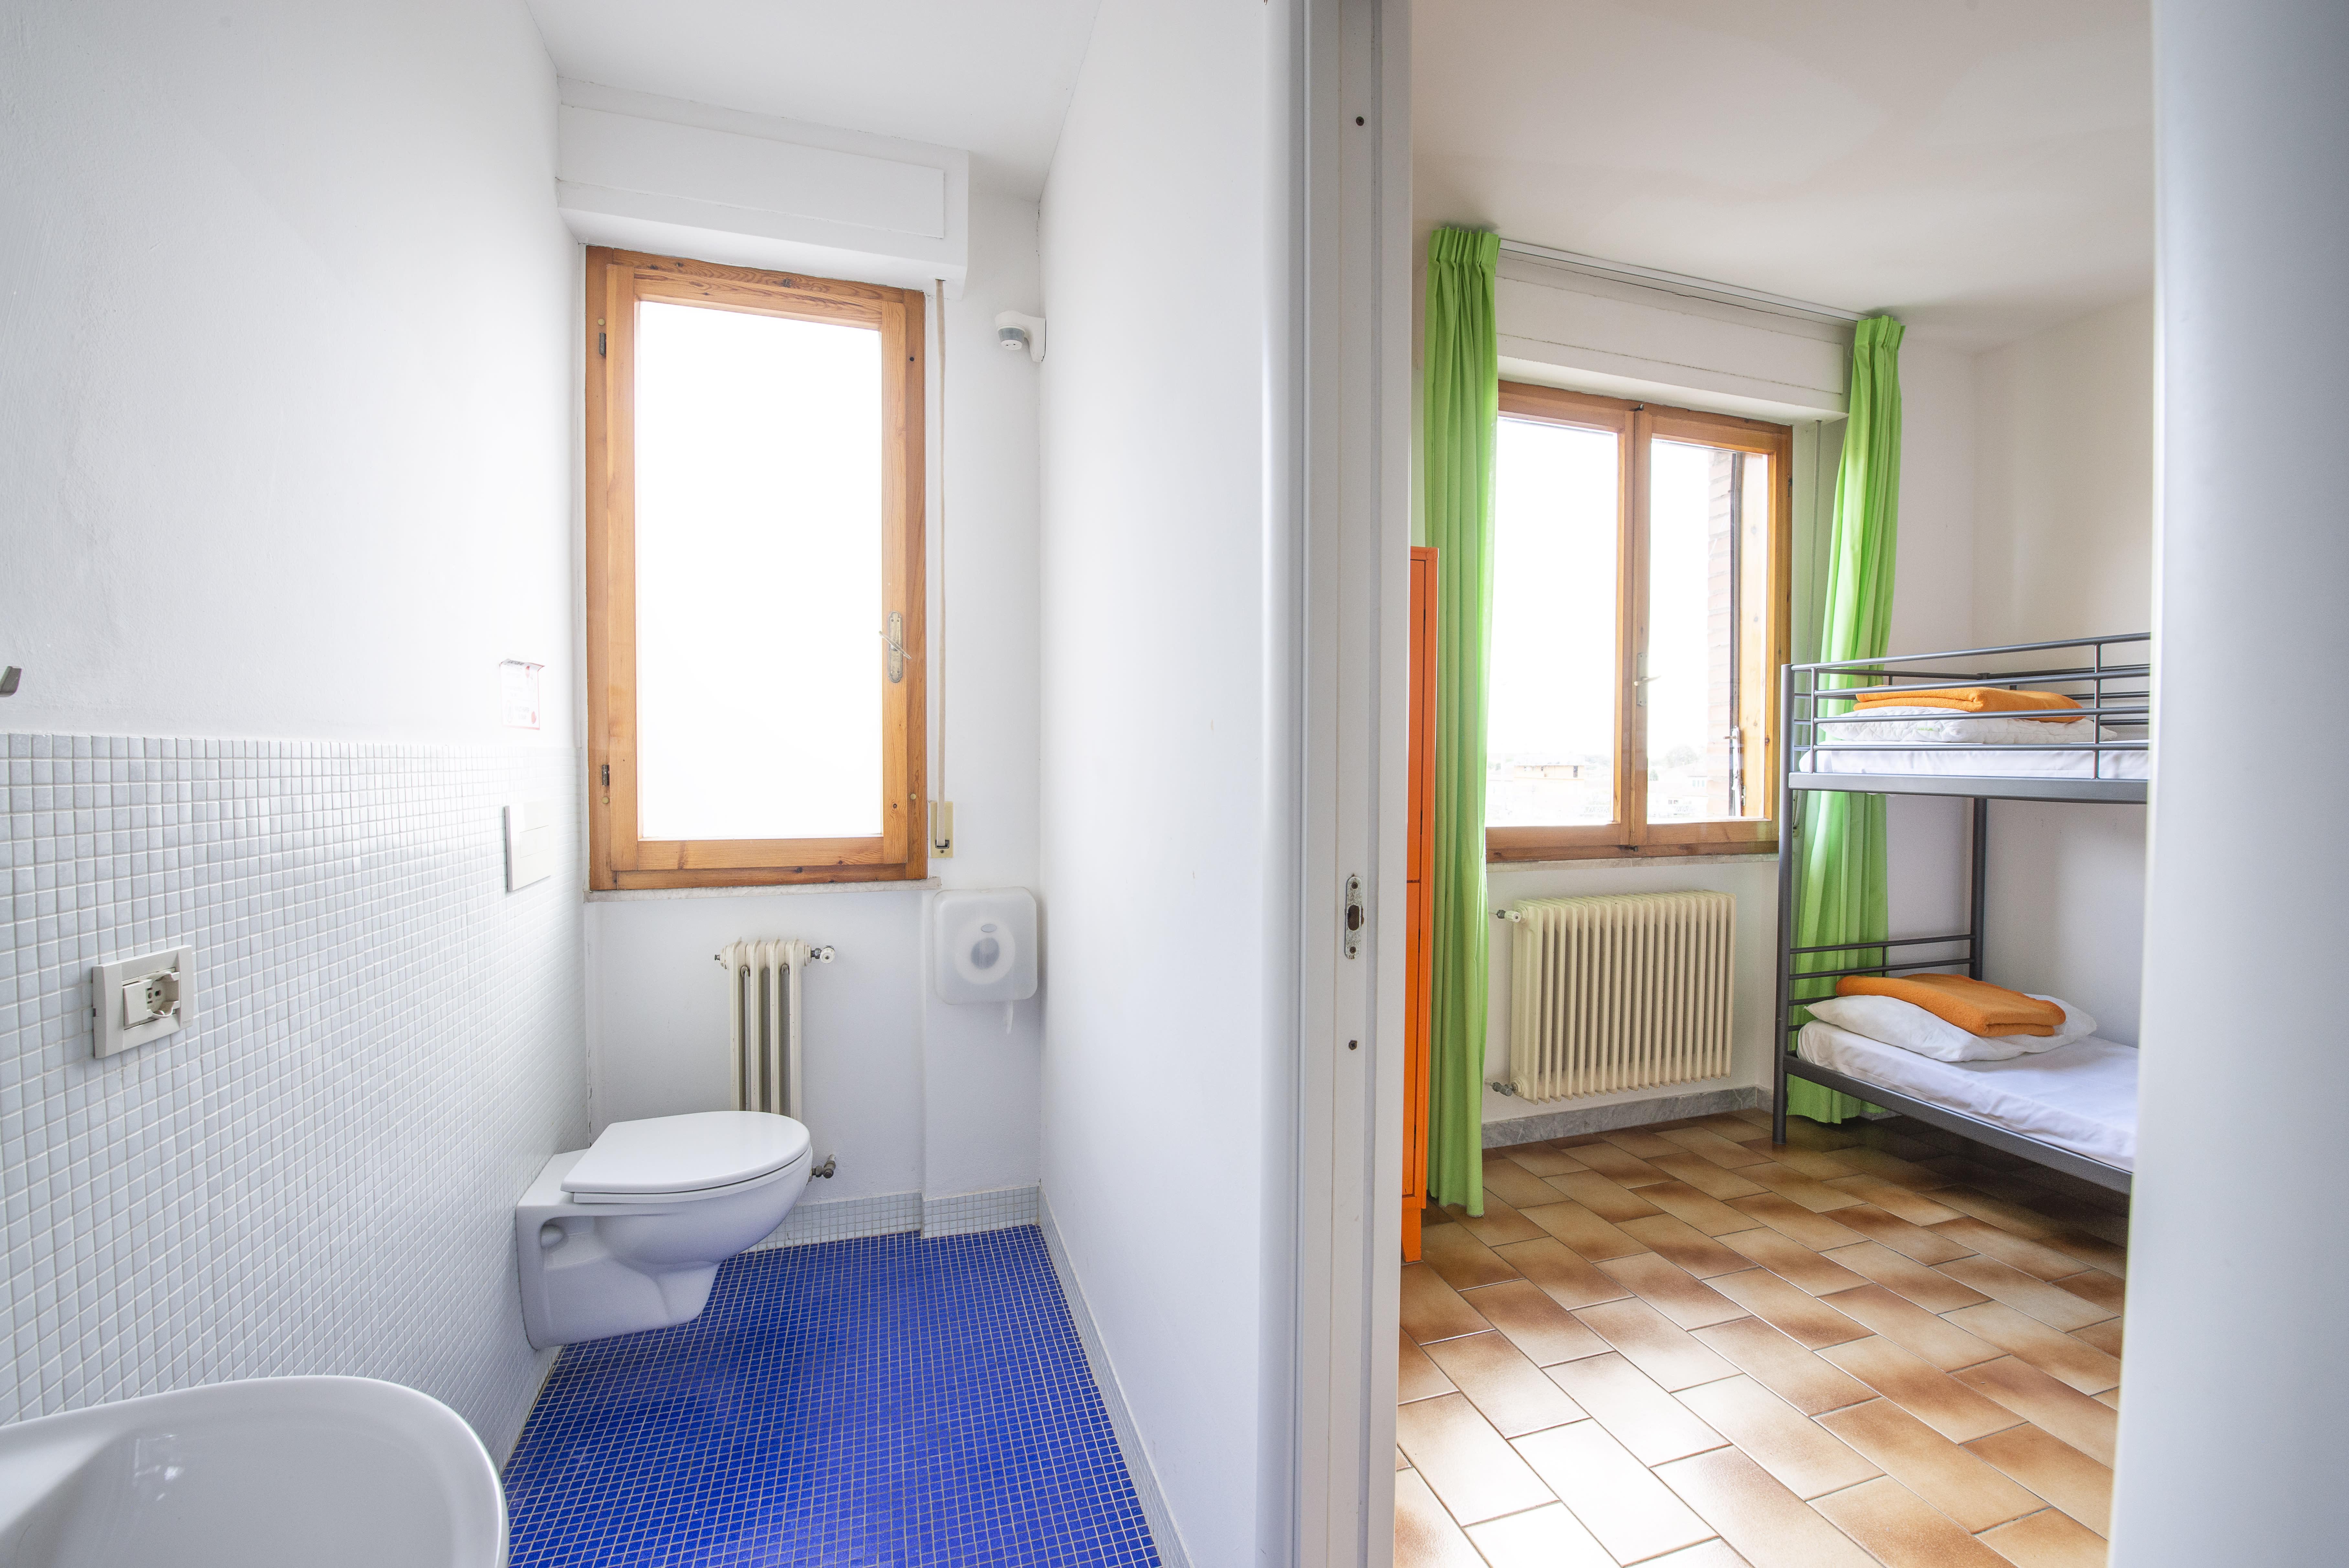 Hostel Pisa